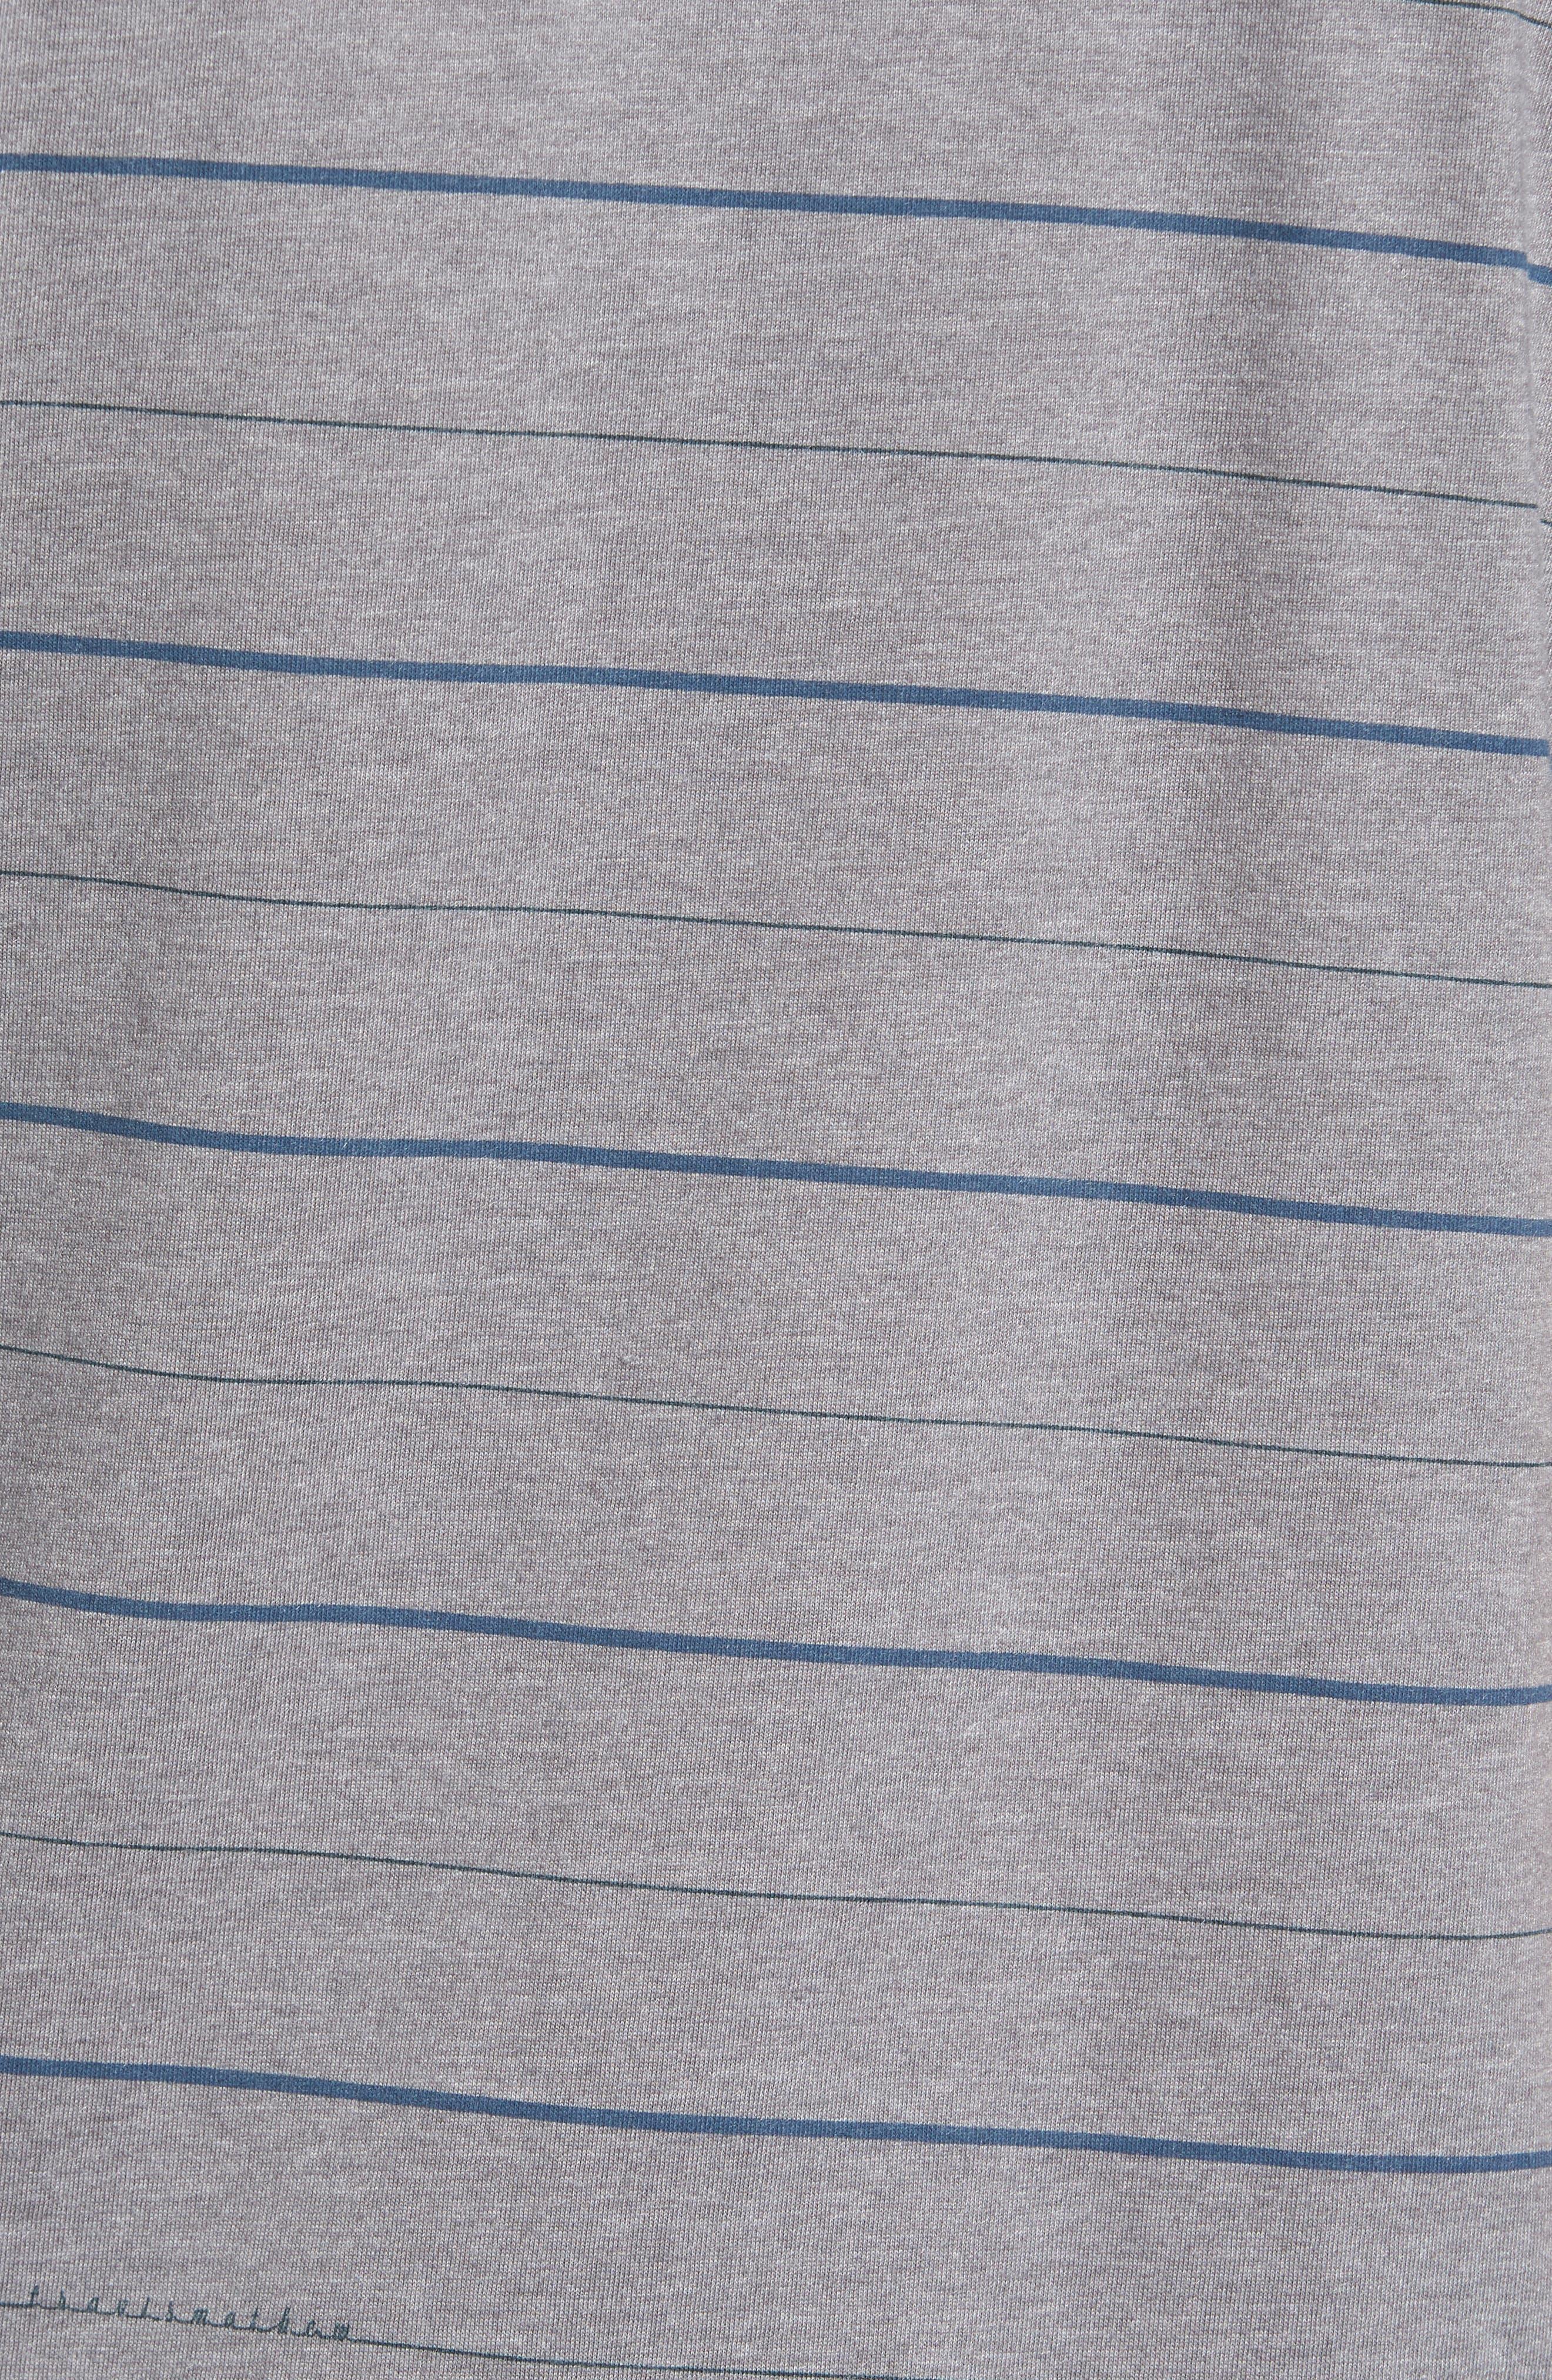 Hodapp T-Shirt,                             Alternate thumbnail 5, color,                             020